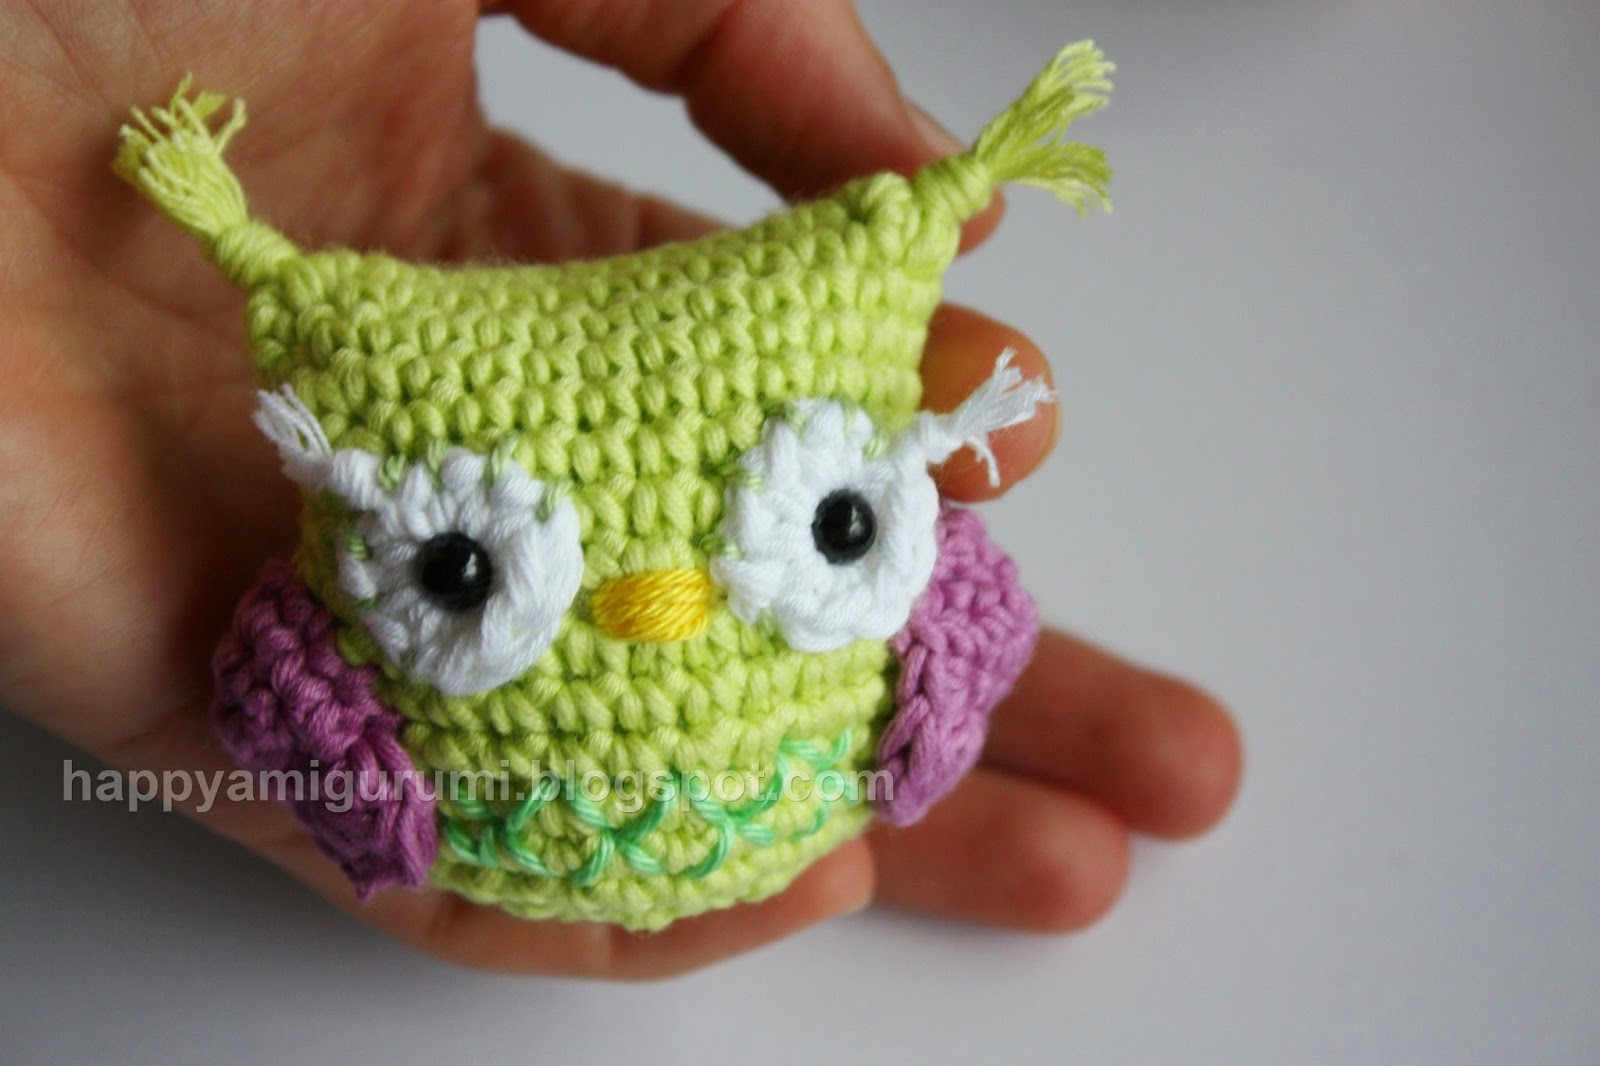 Free Amigurumi Crochet Patterns Owl : HAPPYAMIGURUMI: Free Amigurumi Pattern - OWL